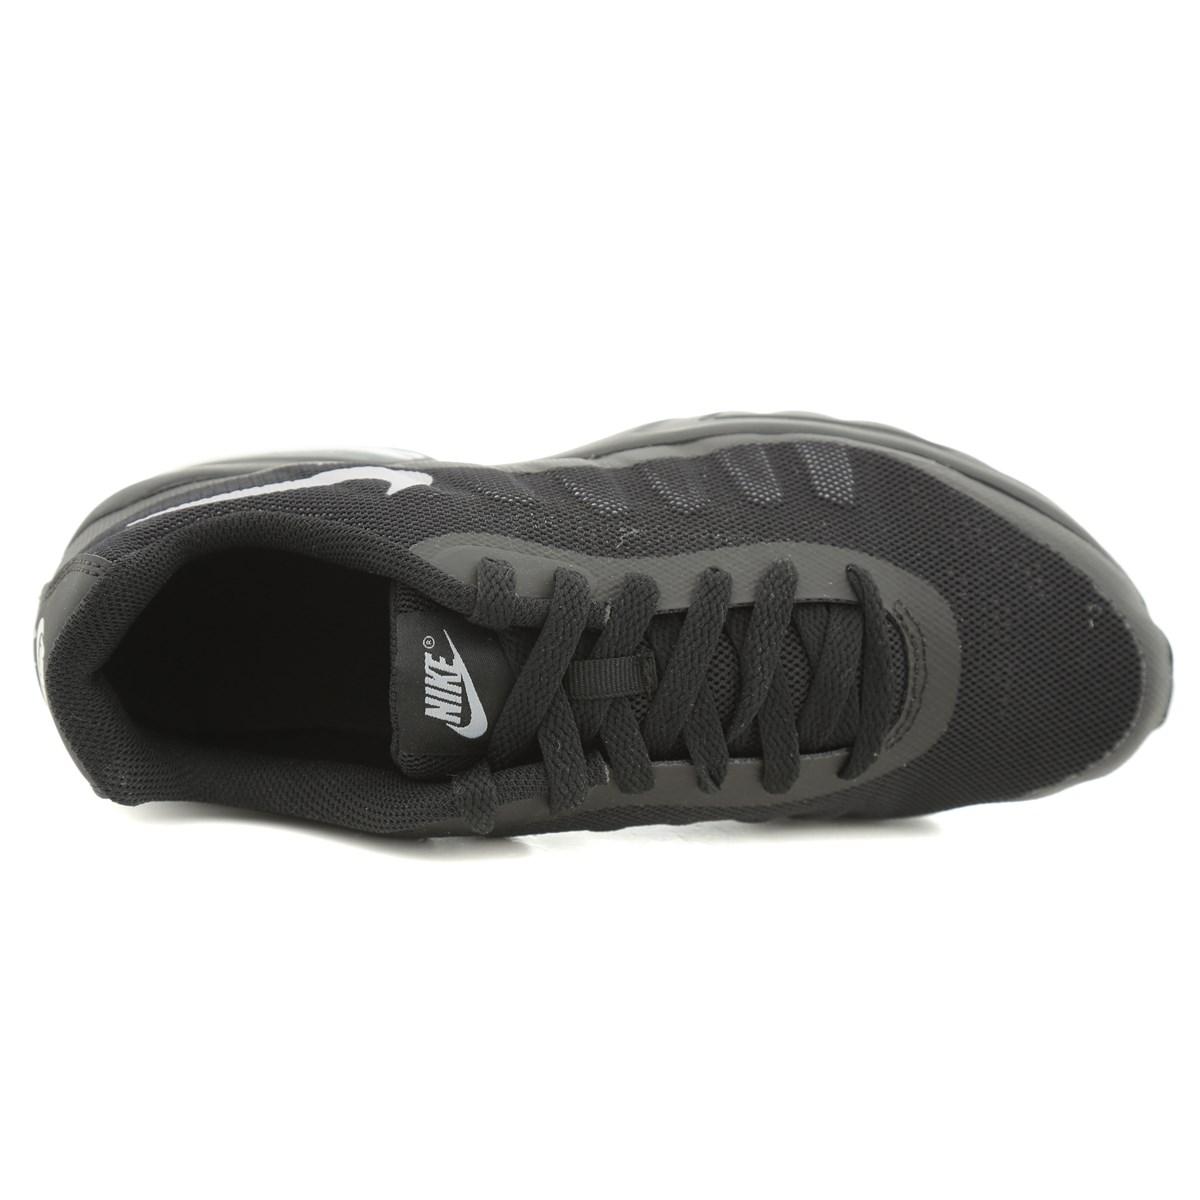 Air Max İnvigor Siyah Spor Ayakkabı